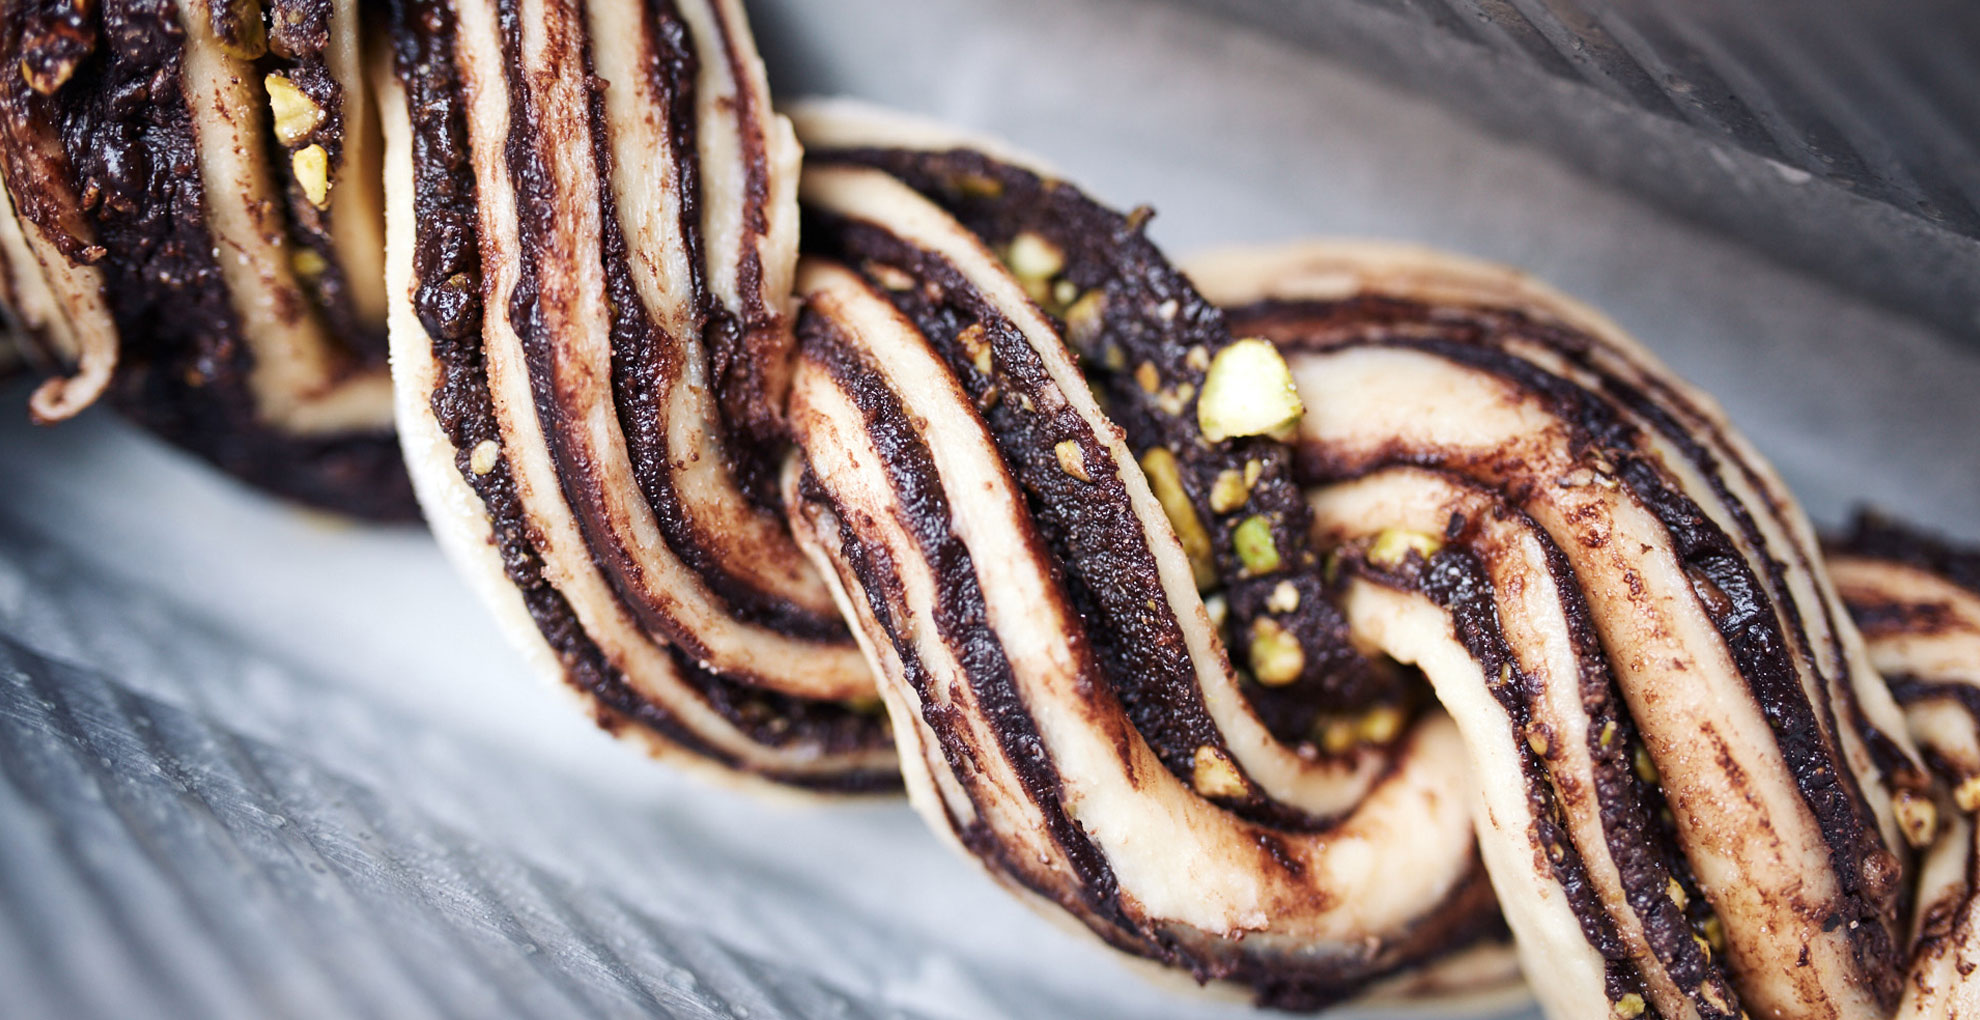 chocolate-krantz-feature-image